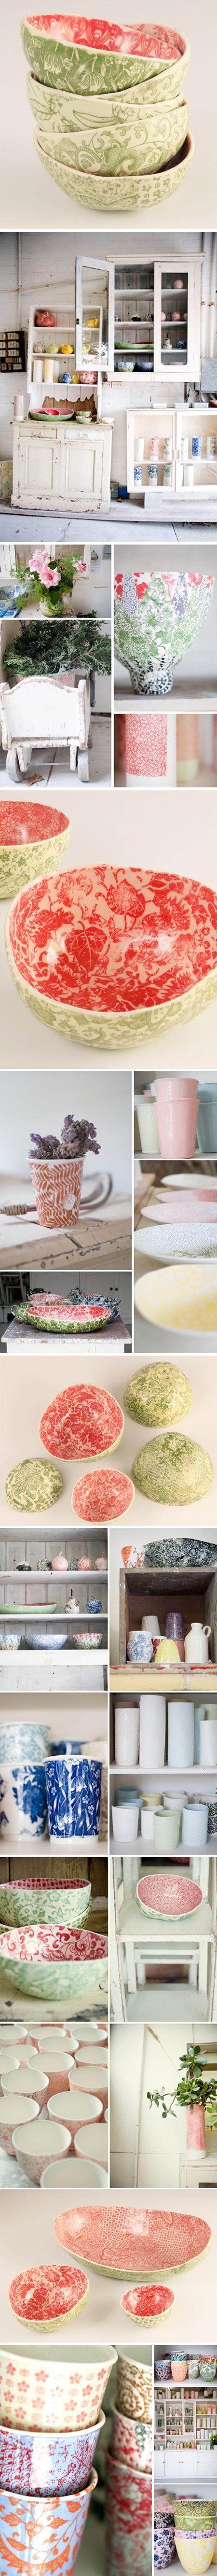 Australian artist Samantha Robinsons fabulous porcelain creations